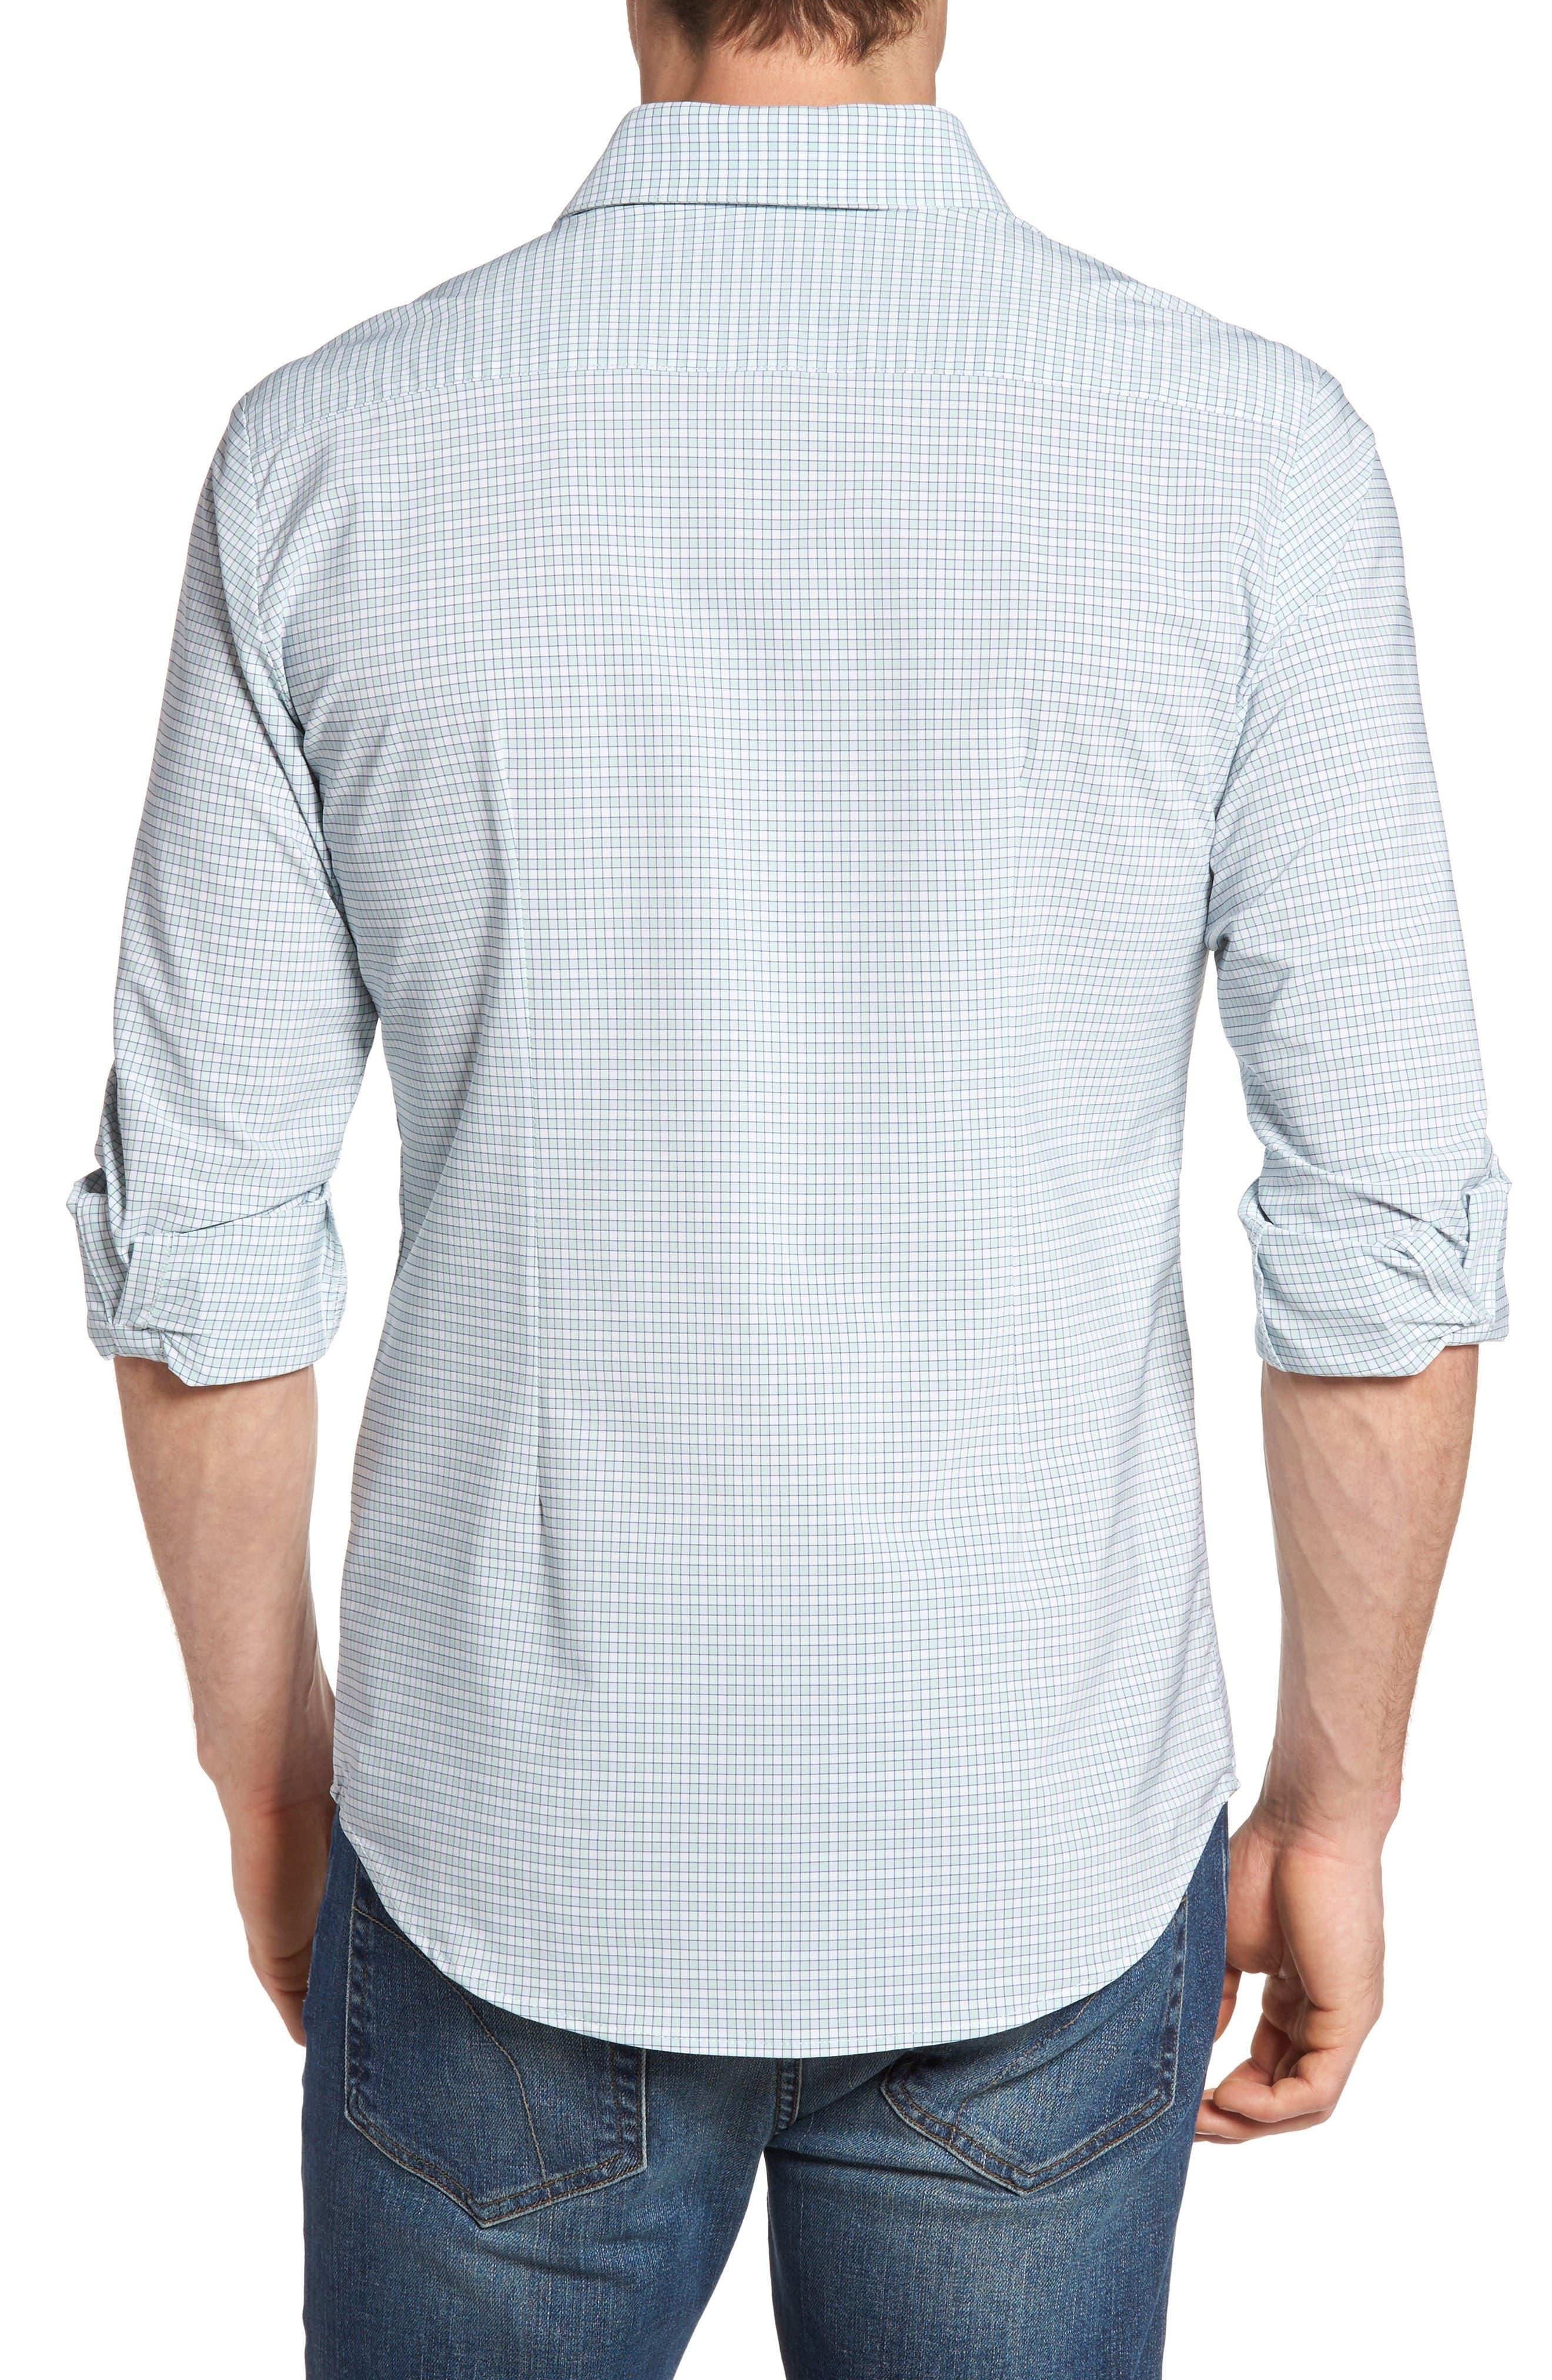 Thames Illusion Gingham Performance Sport Shirt,                             Alternate thumbnail 2, color,                             Aqua